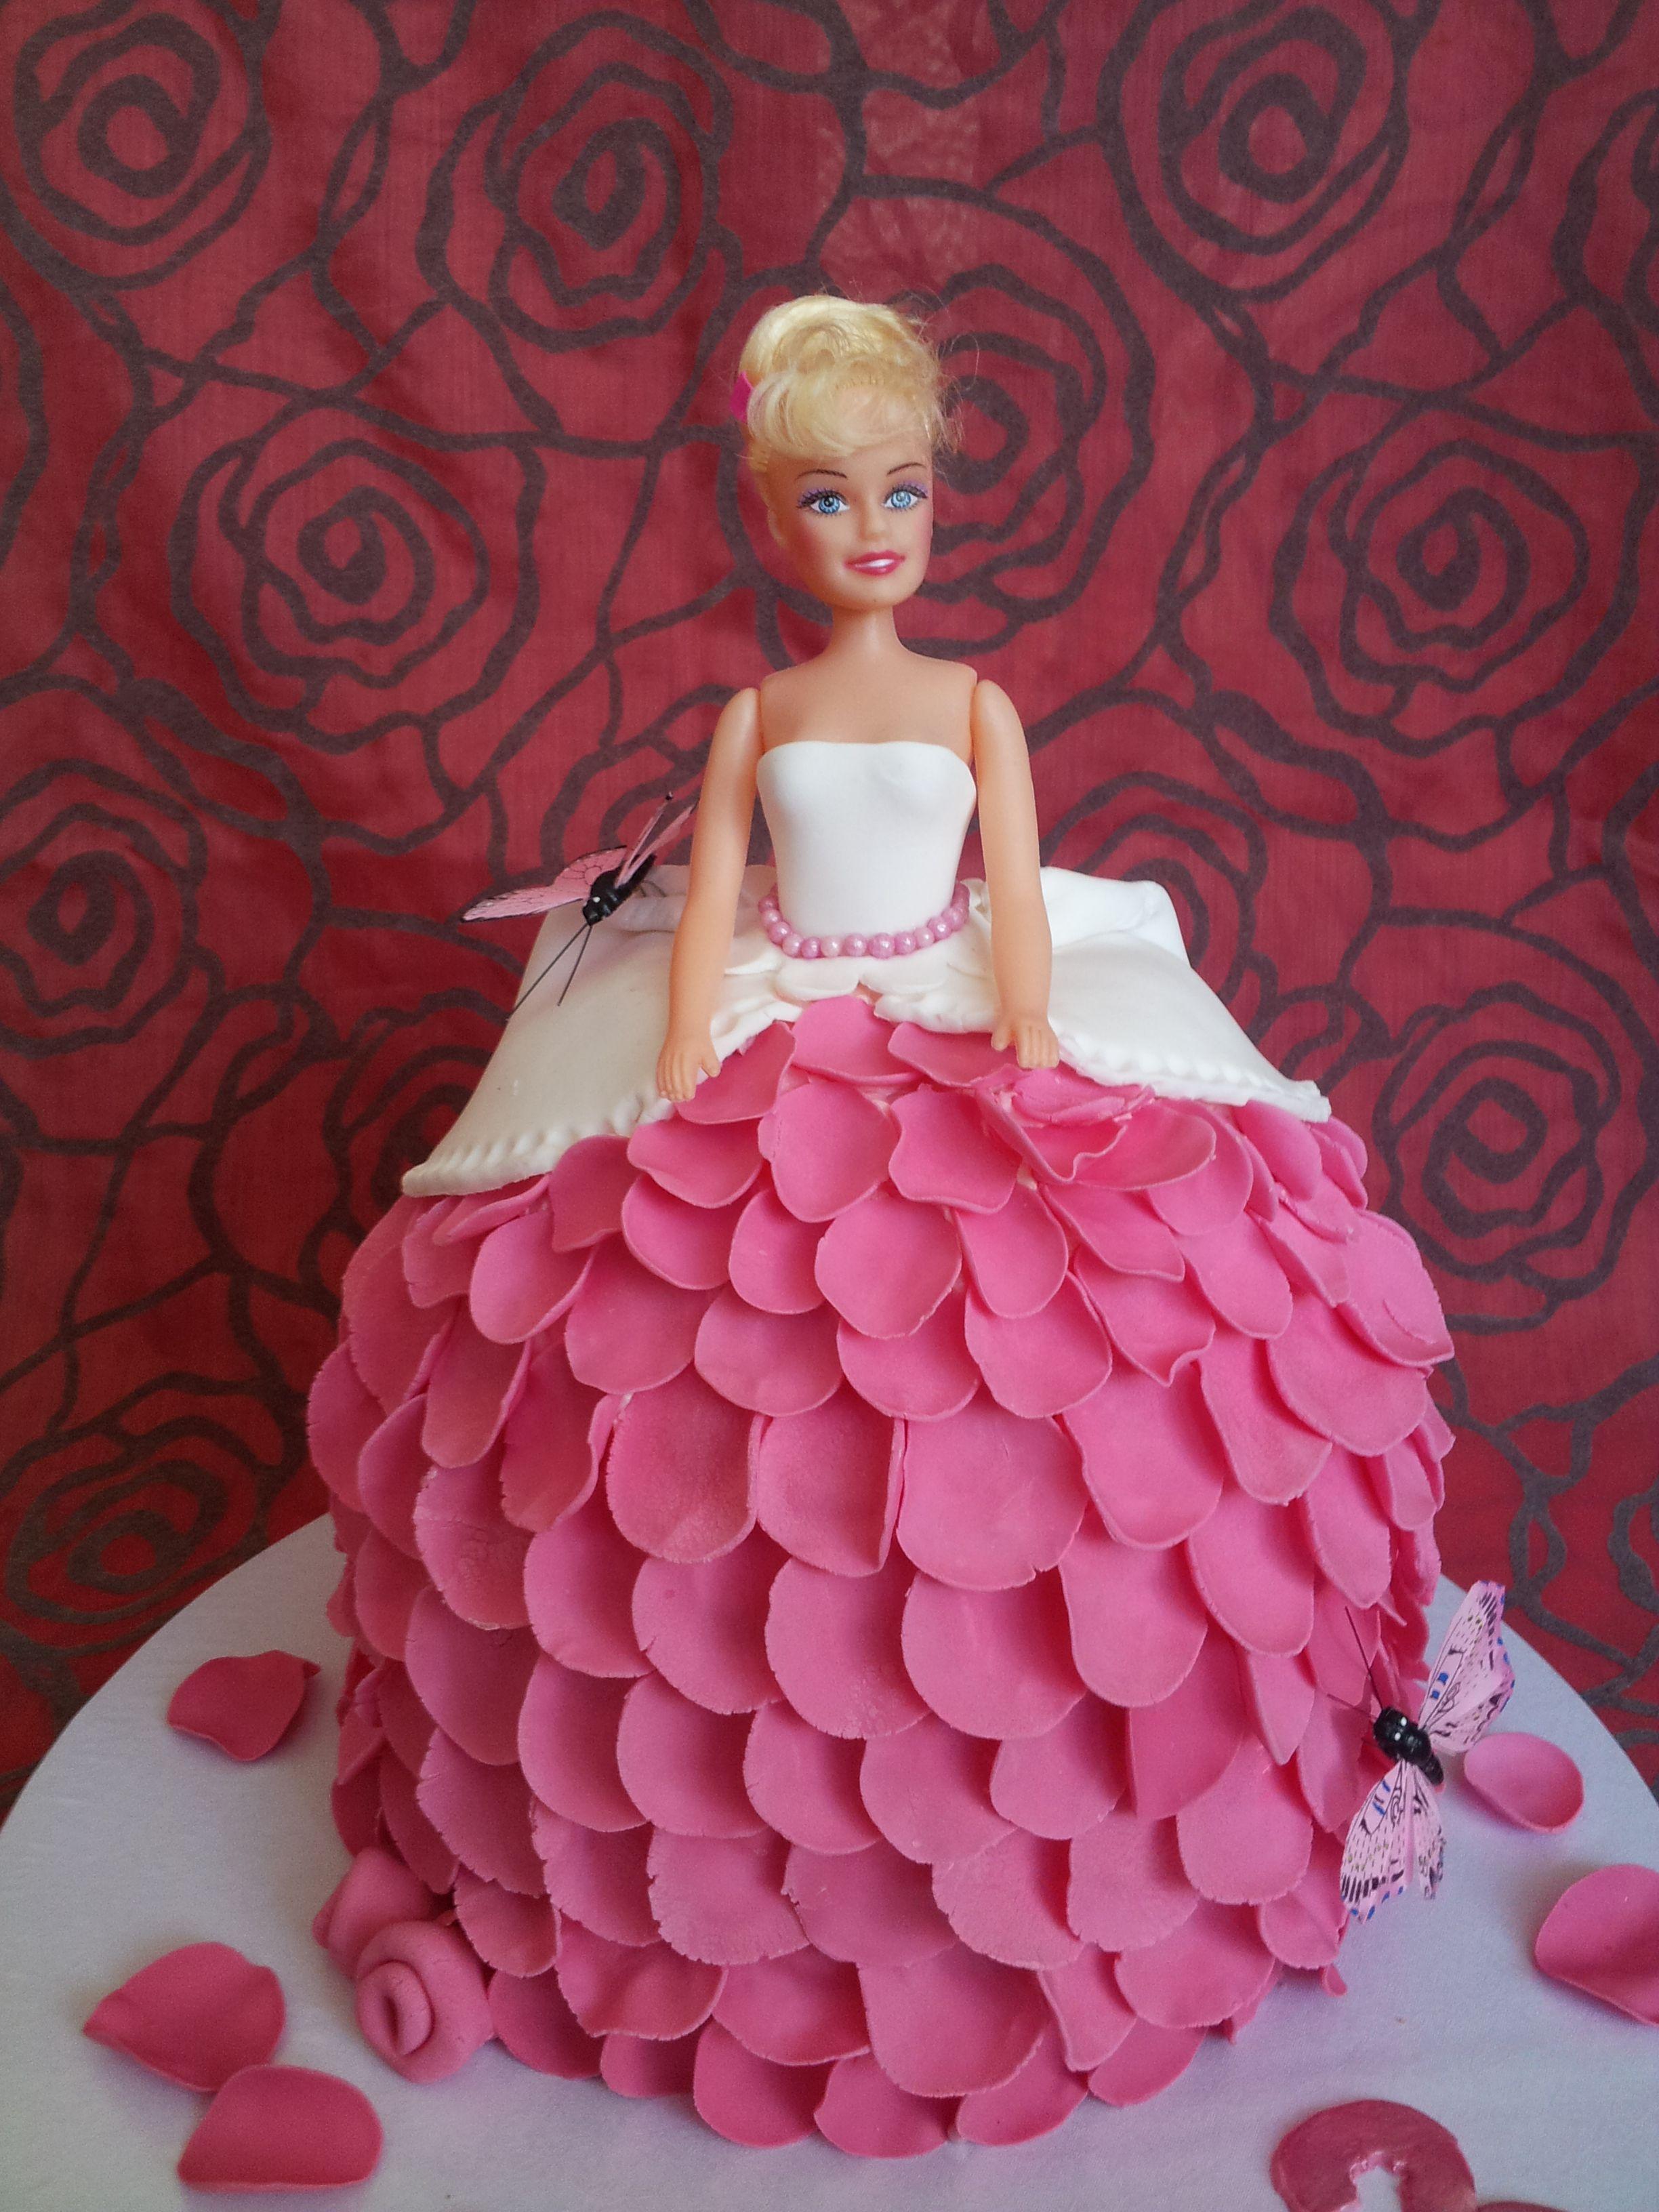 Barbir Rose Children S Birthday Cakes Childrens Birthday Cakes Cute Cakes Cake